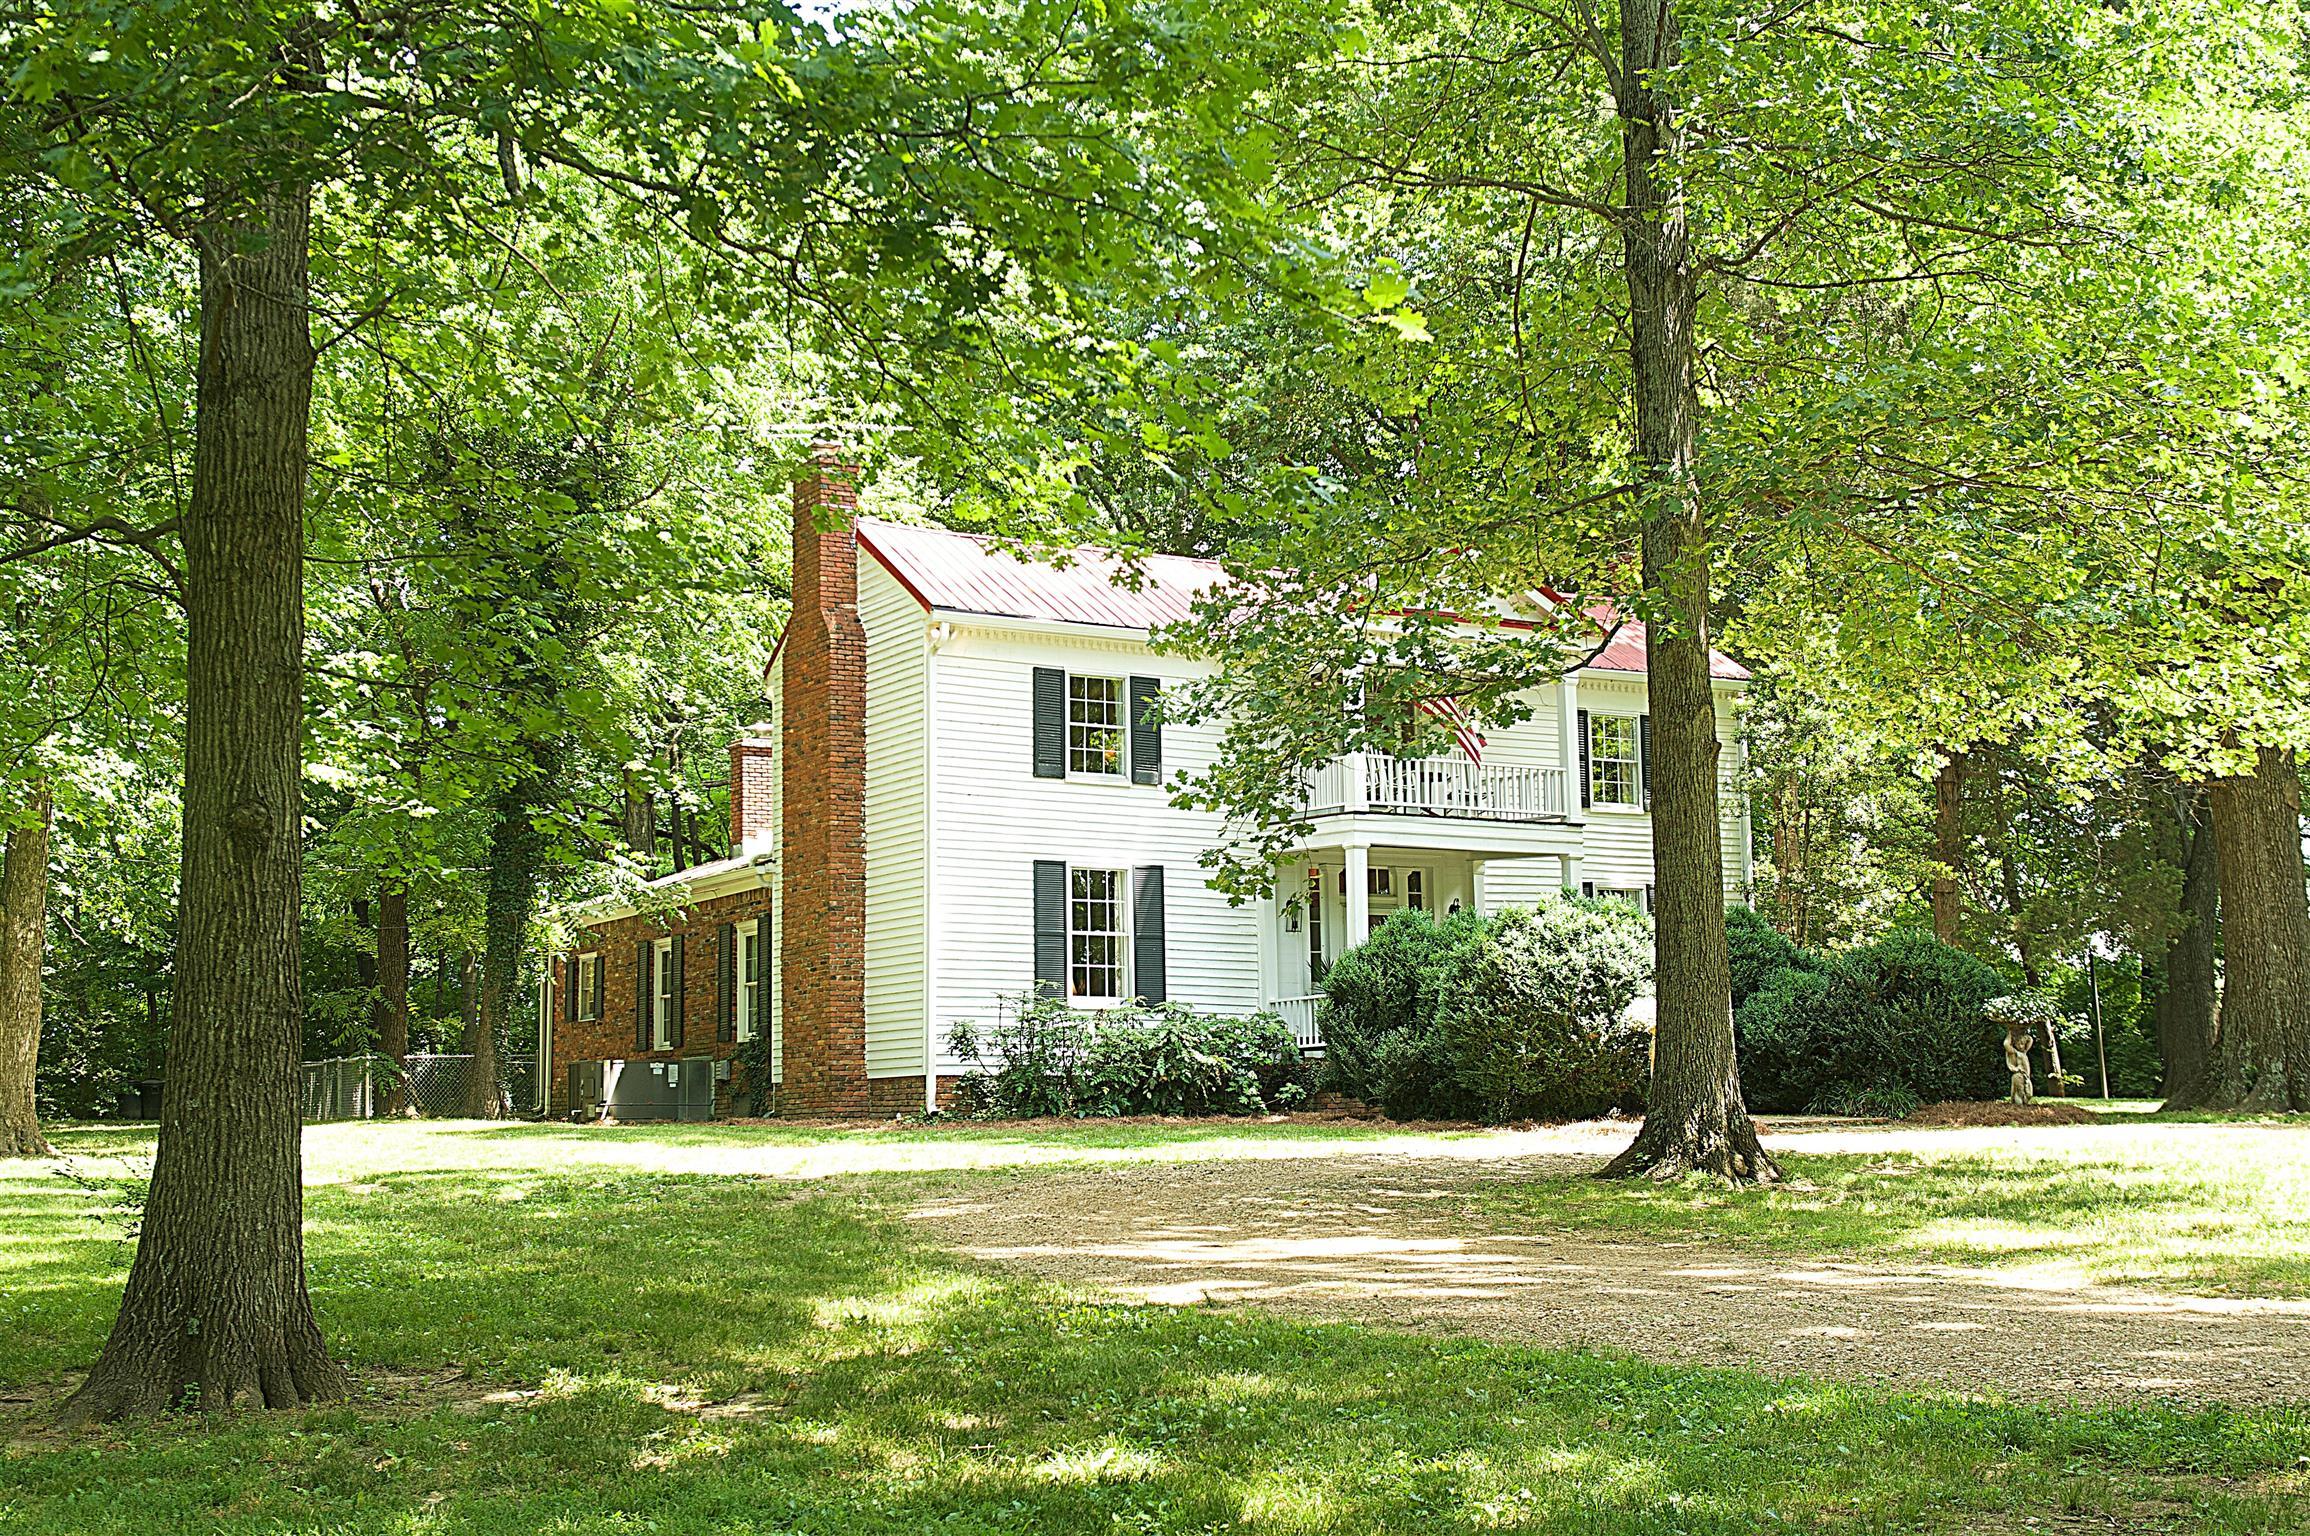 588 Douglas Lane, Gallatin, TN 37066 - Gallatin, TN real estate listing